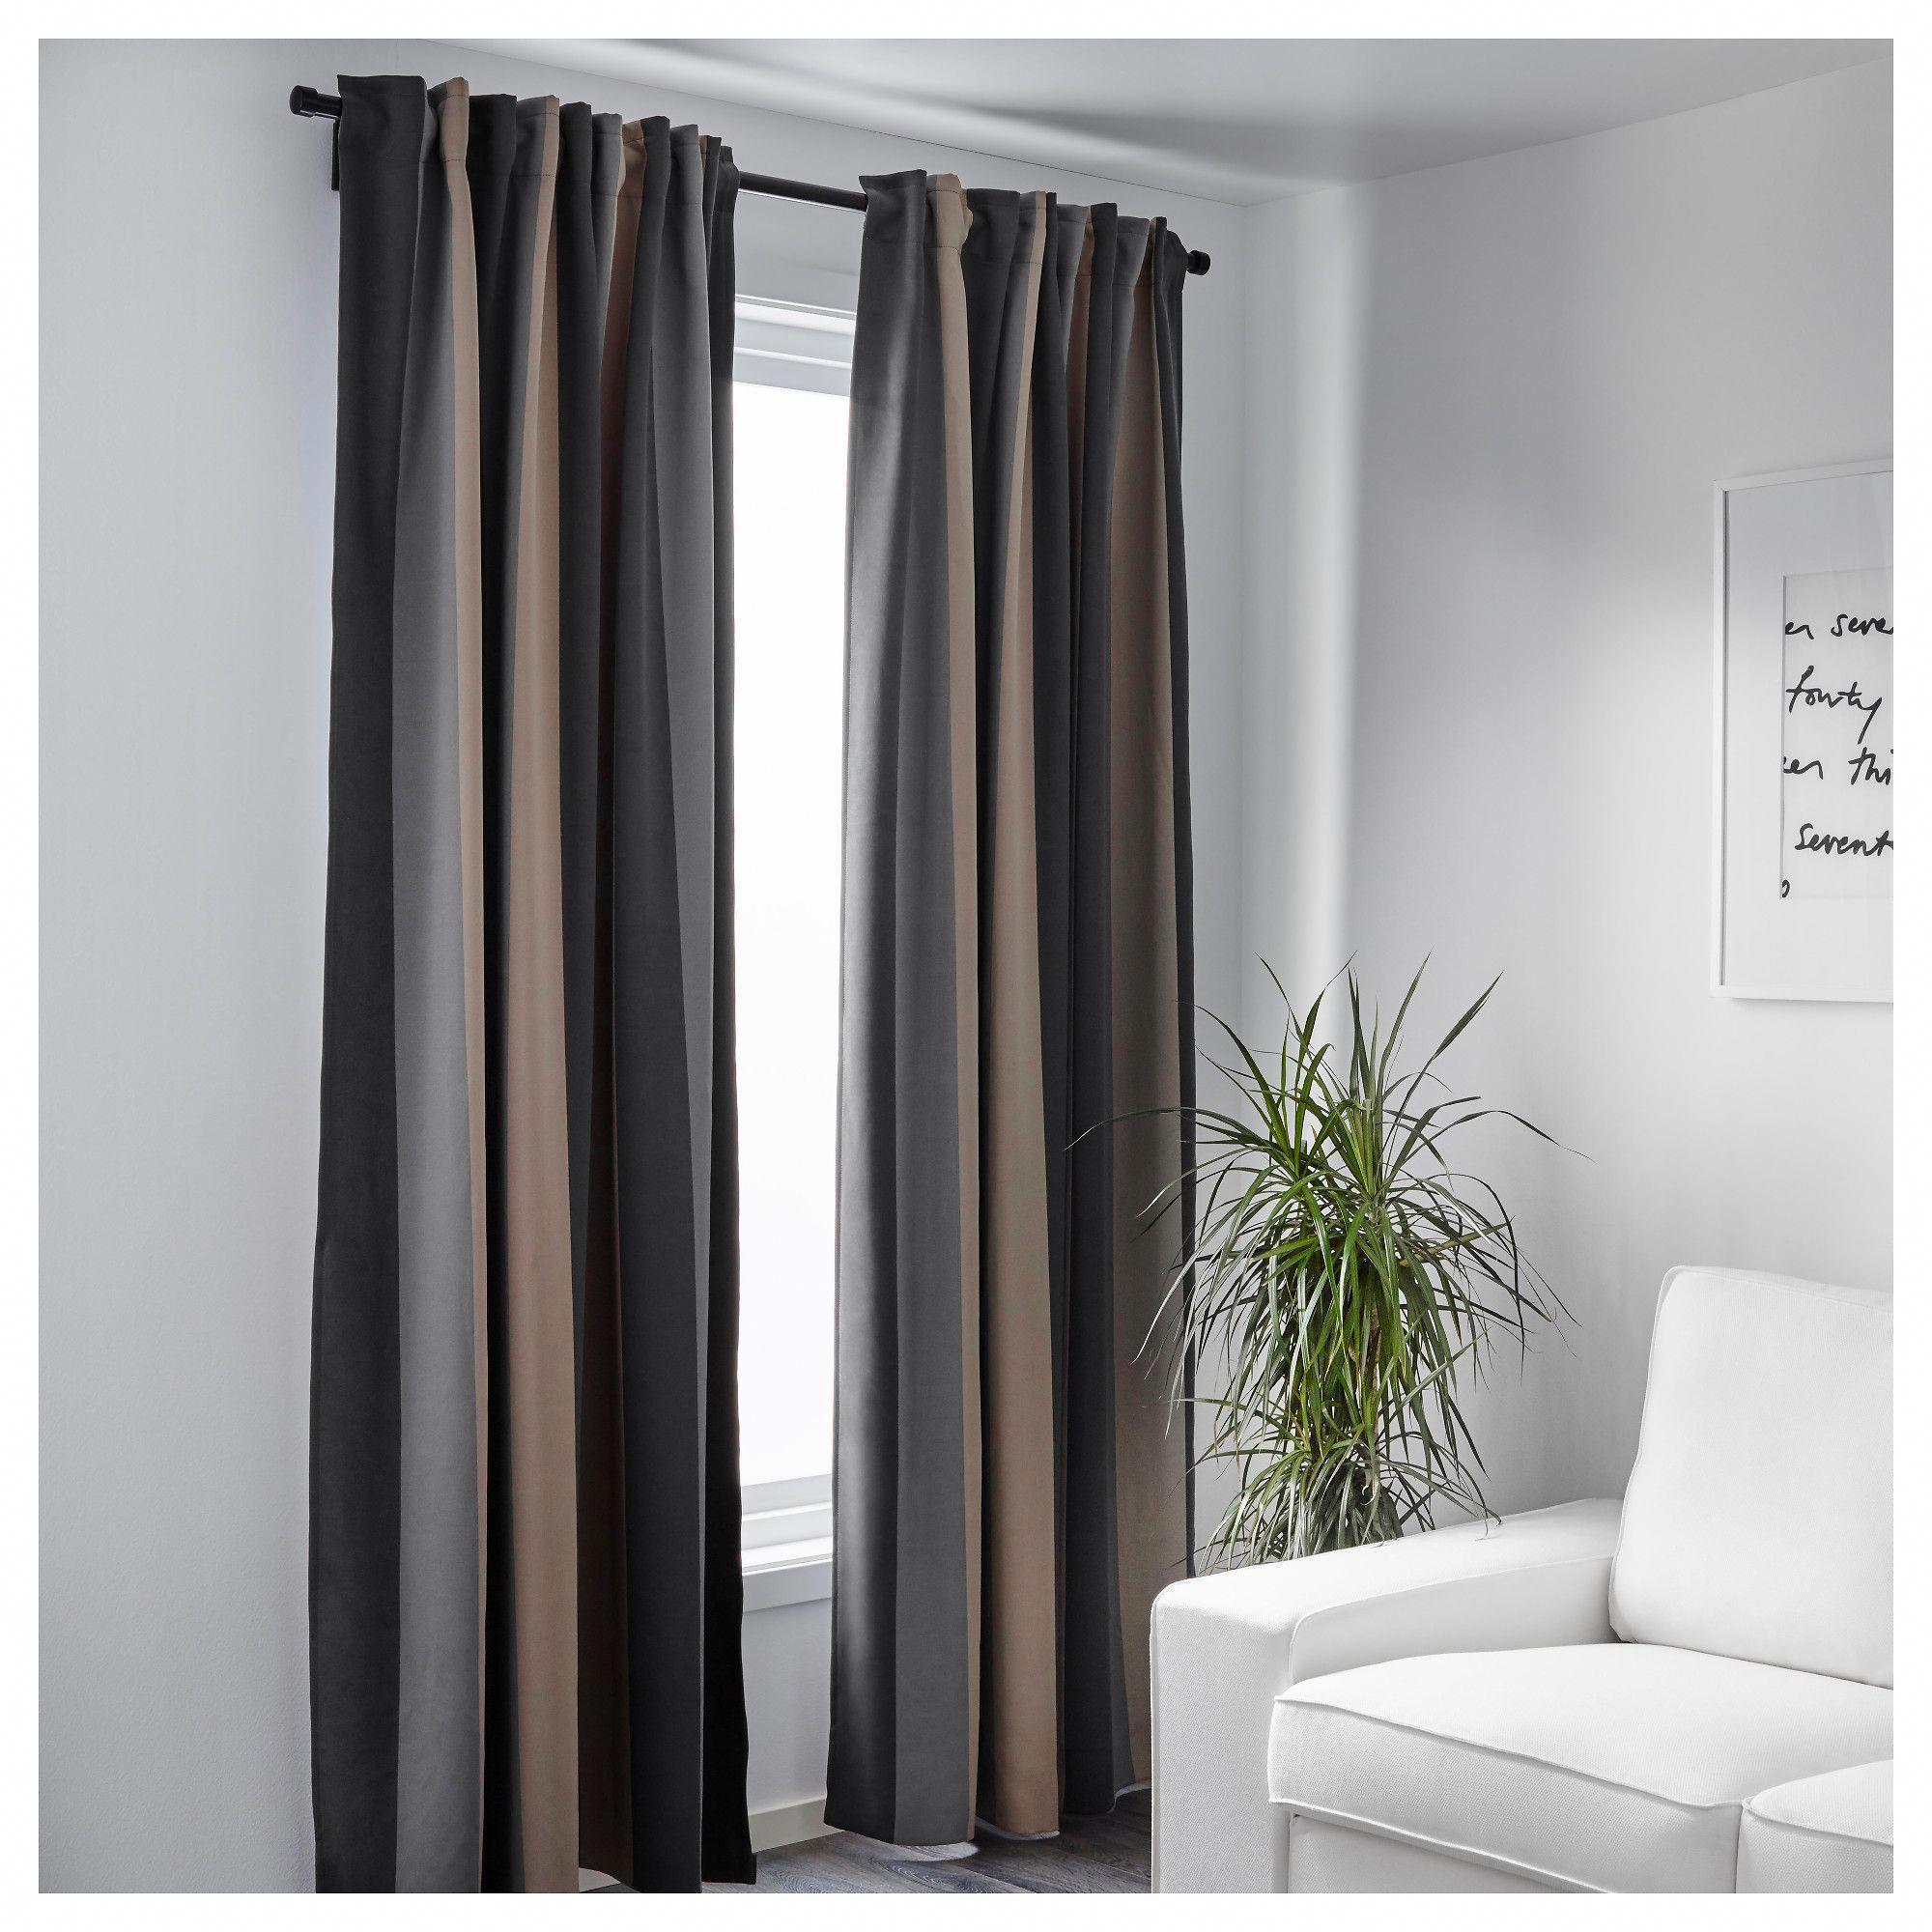 Ikea Praktlilja Blackout Curtains 1 Pair Gray Beige